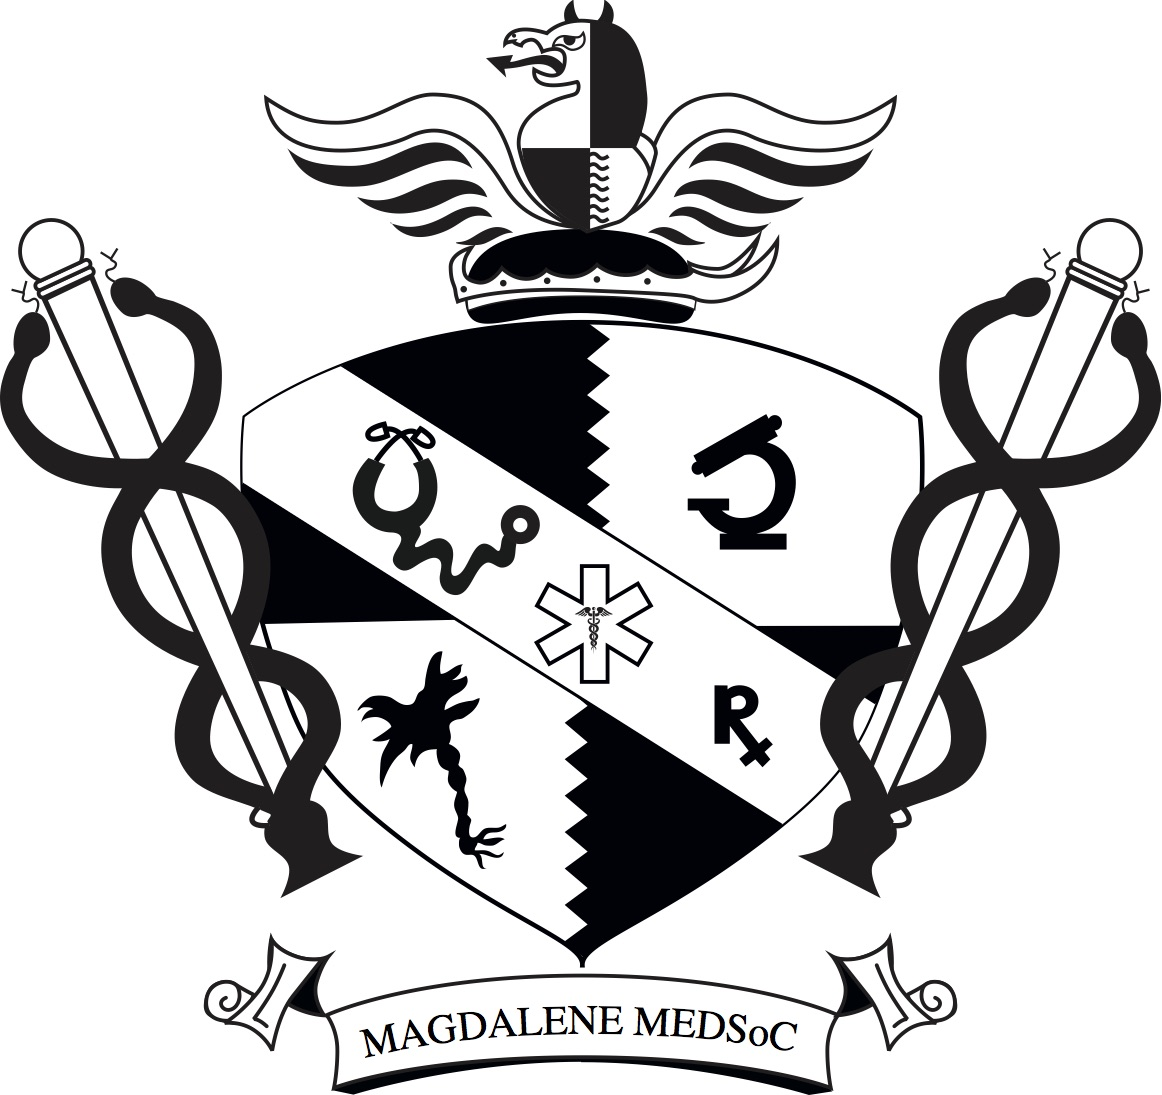 Magdalene Medsoc